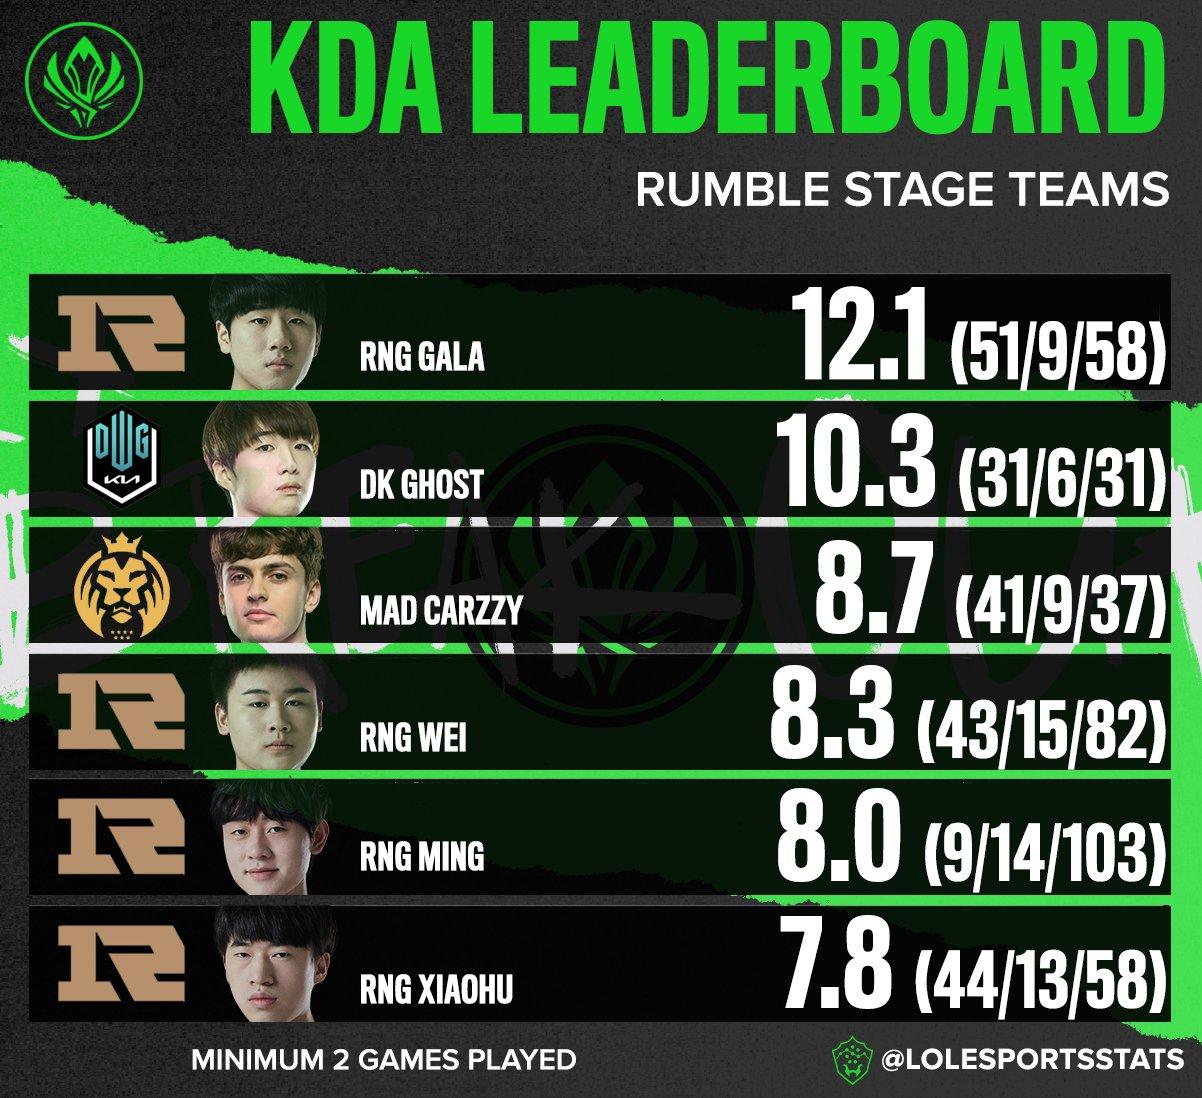 KDA最高的六名選手中,有四名來自RNG。 圖:翻攝自LoL Esports